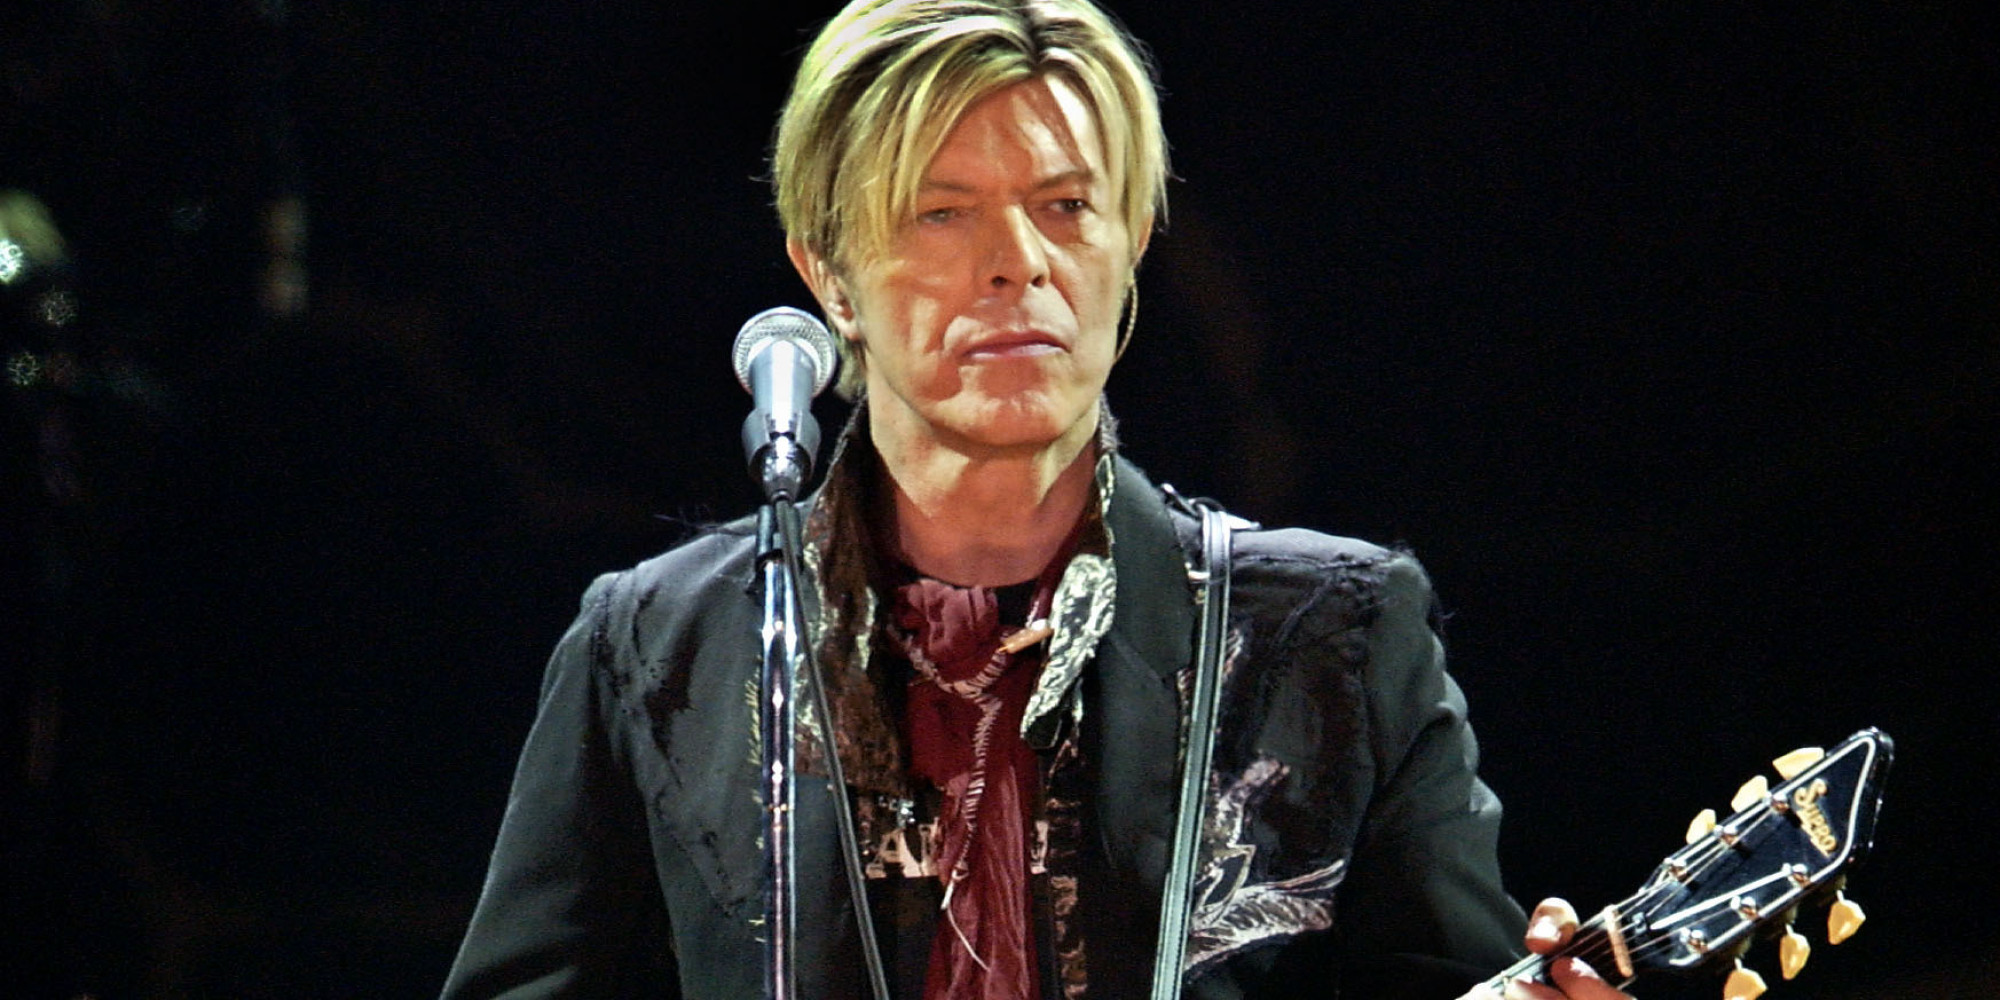 Arabic Wallpaper Iphone David Bowie Est Mort